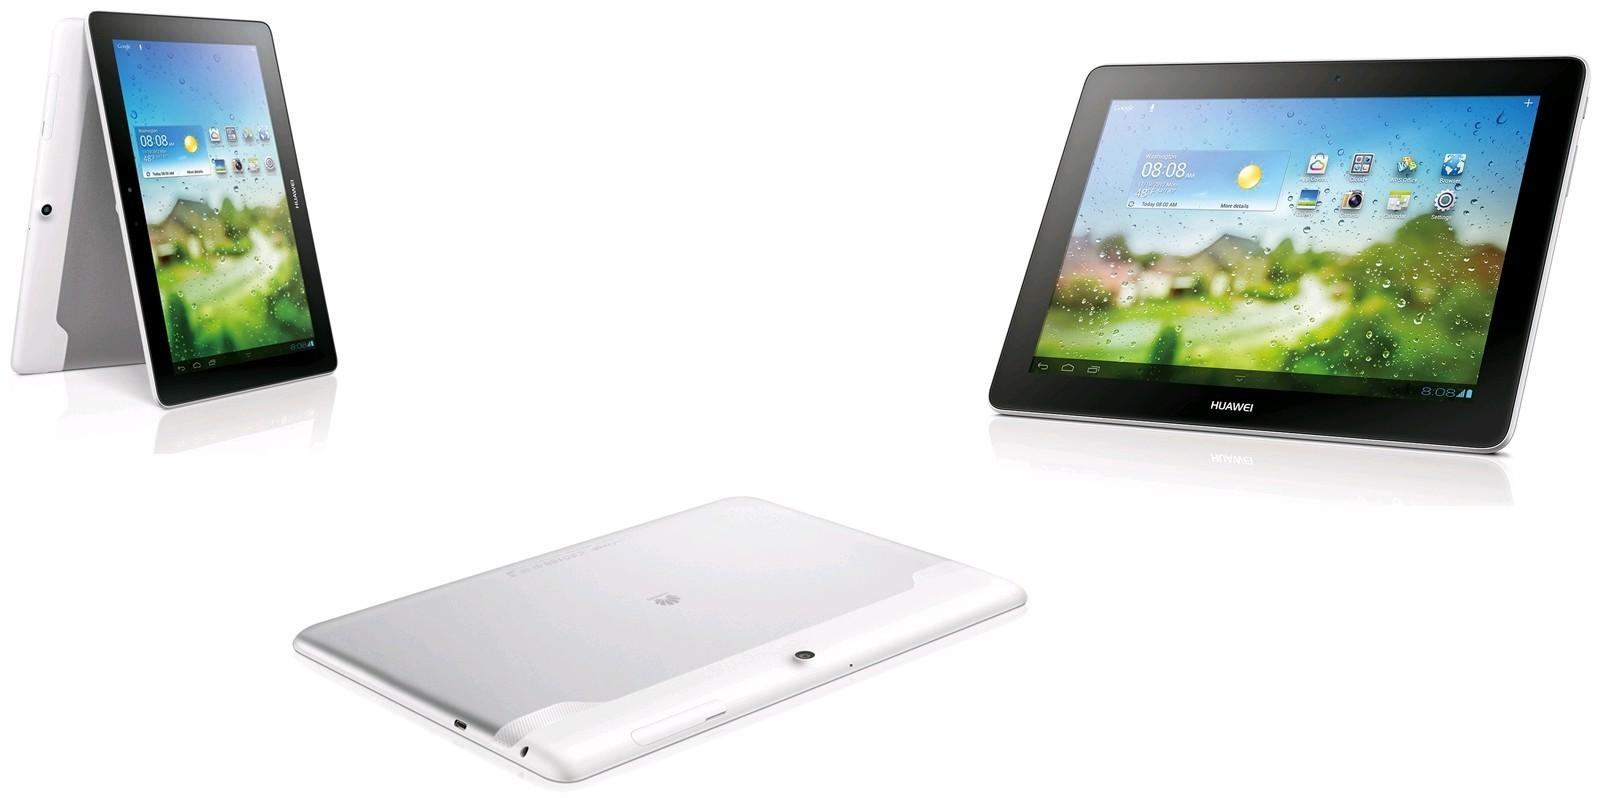 Huawei MediaPad 10 Link 3G S10-201u - Specs and Price - Phonegg